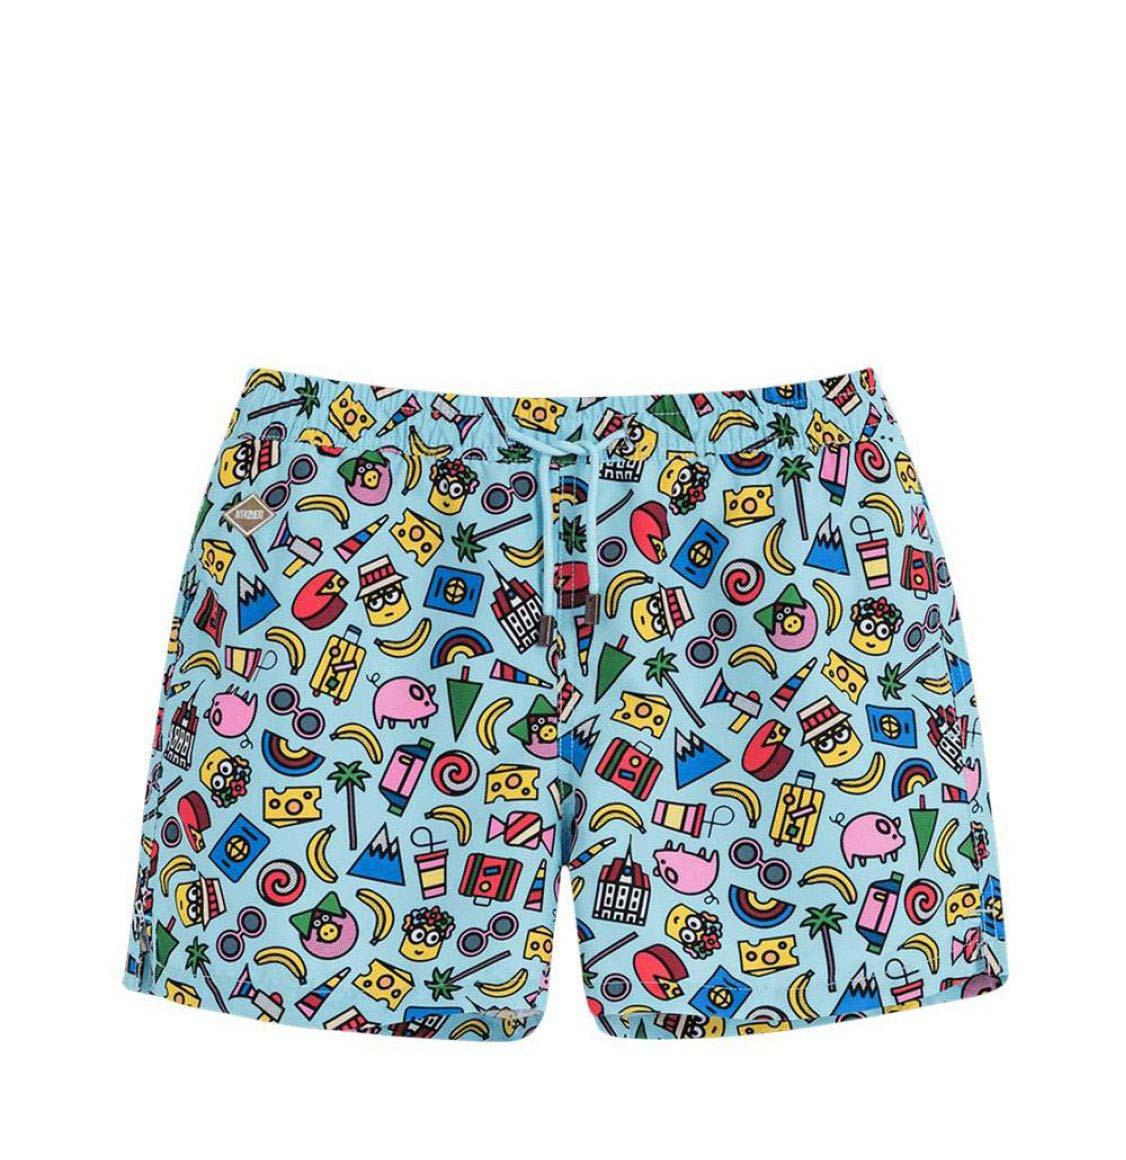 Nikben Minions Swim Shorts Light Blue